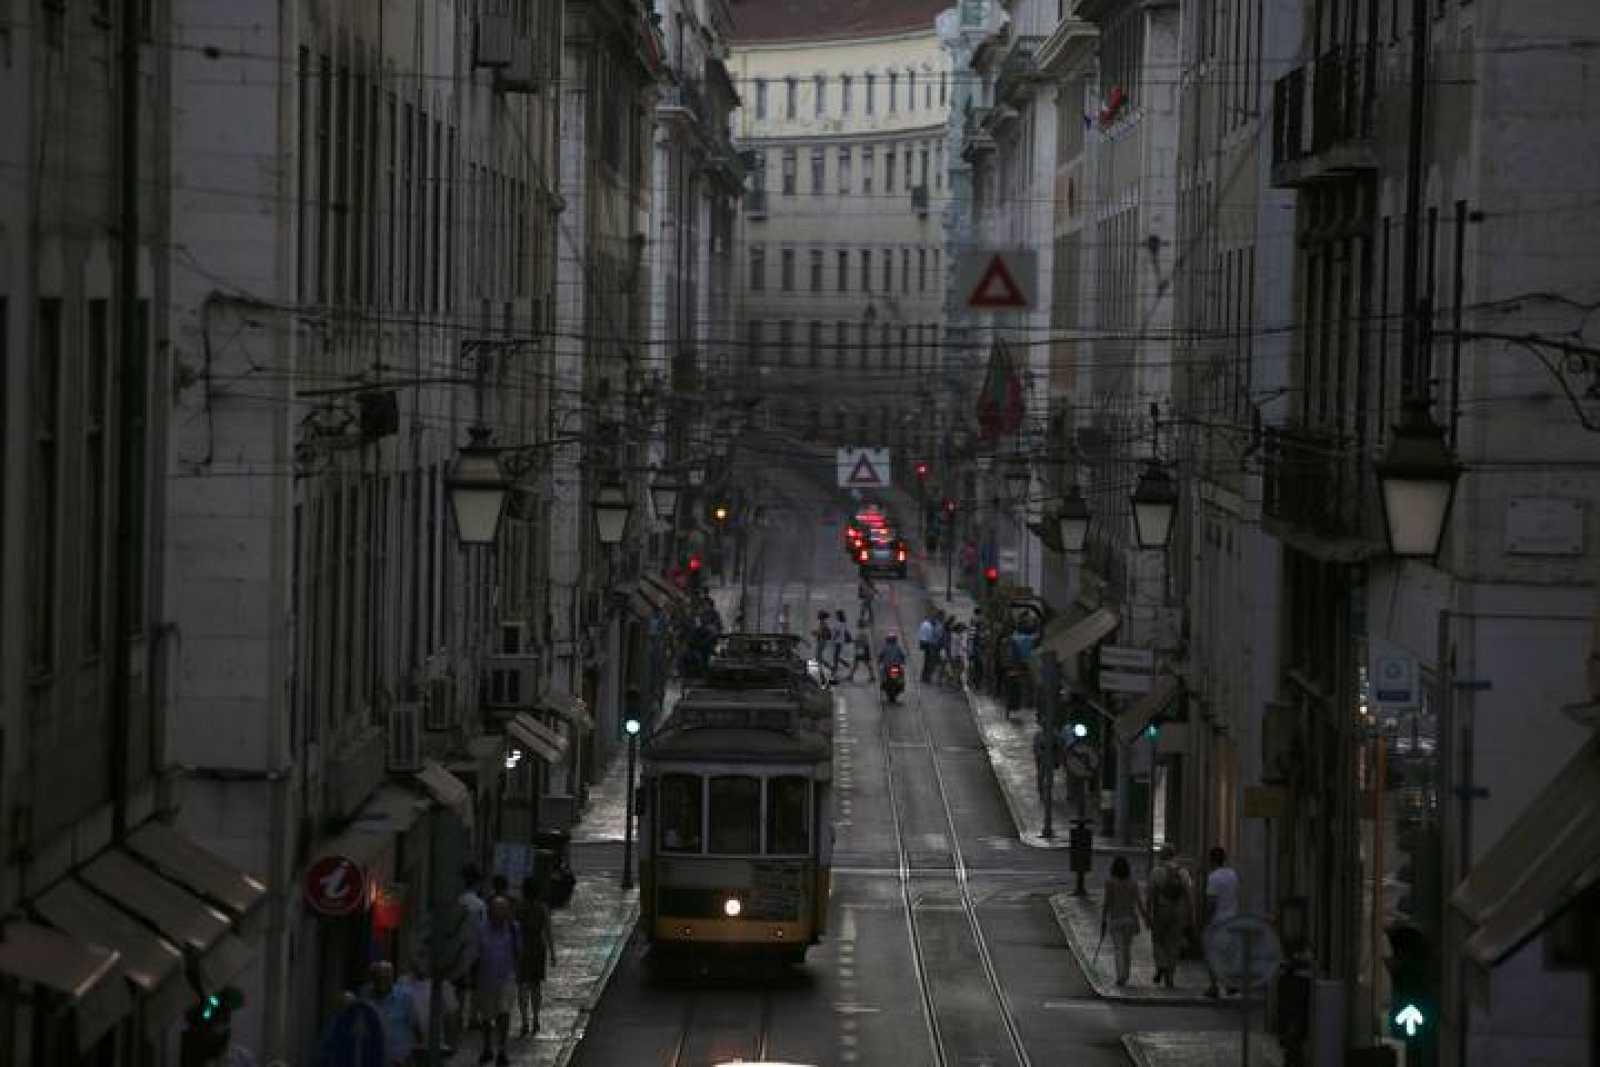 El centro de Lisboa